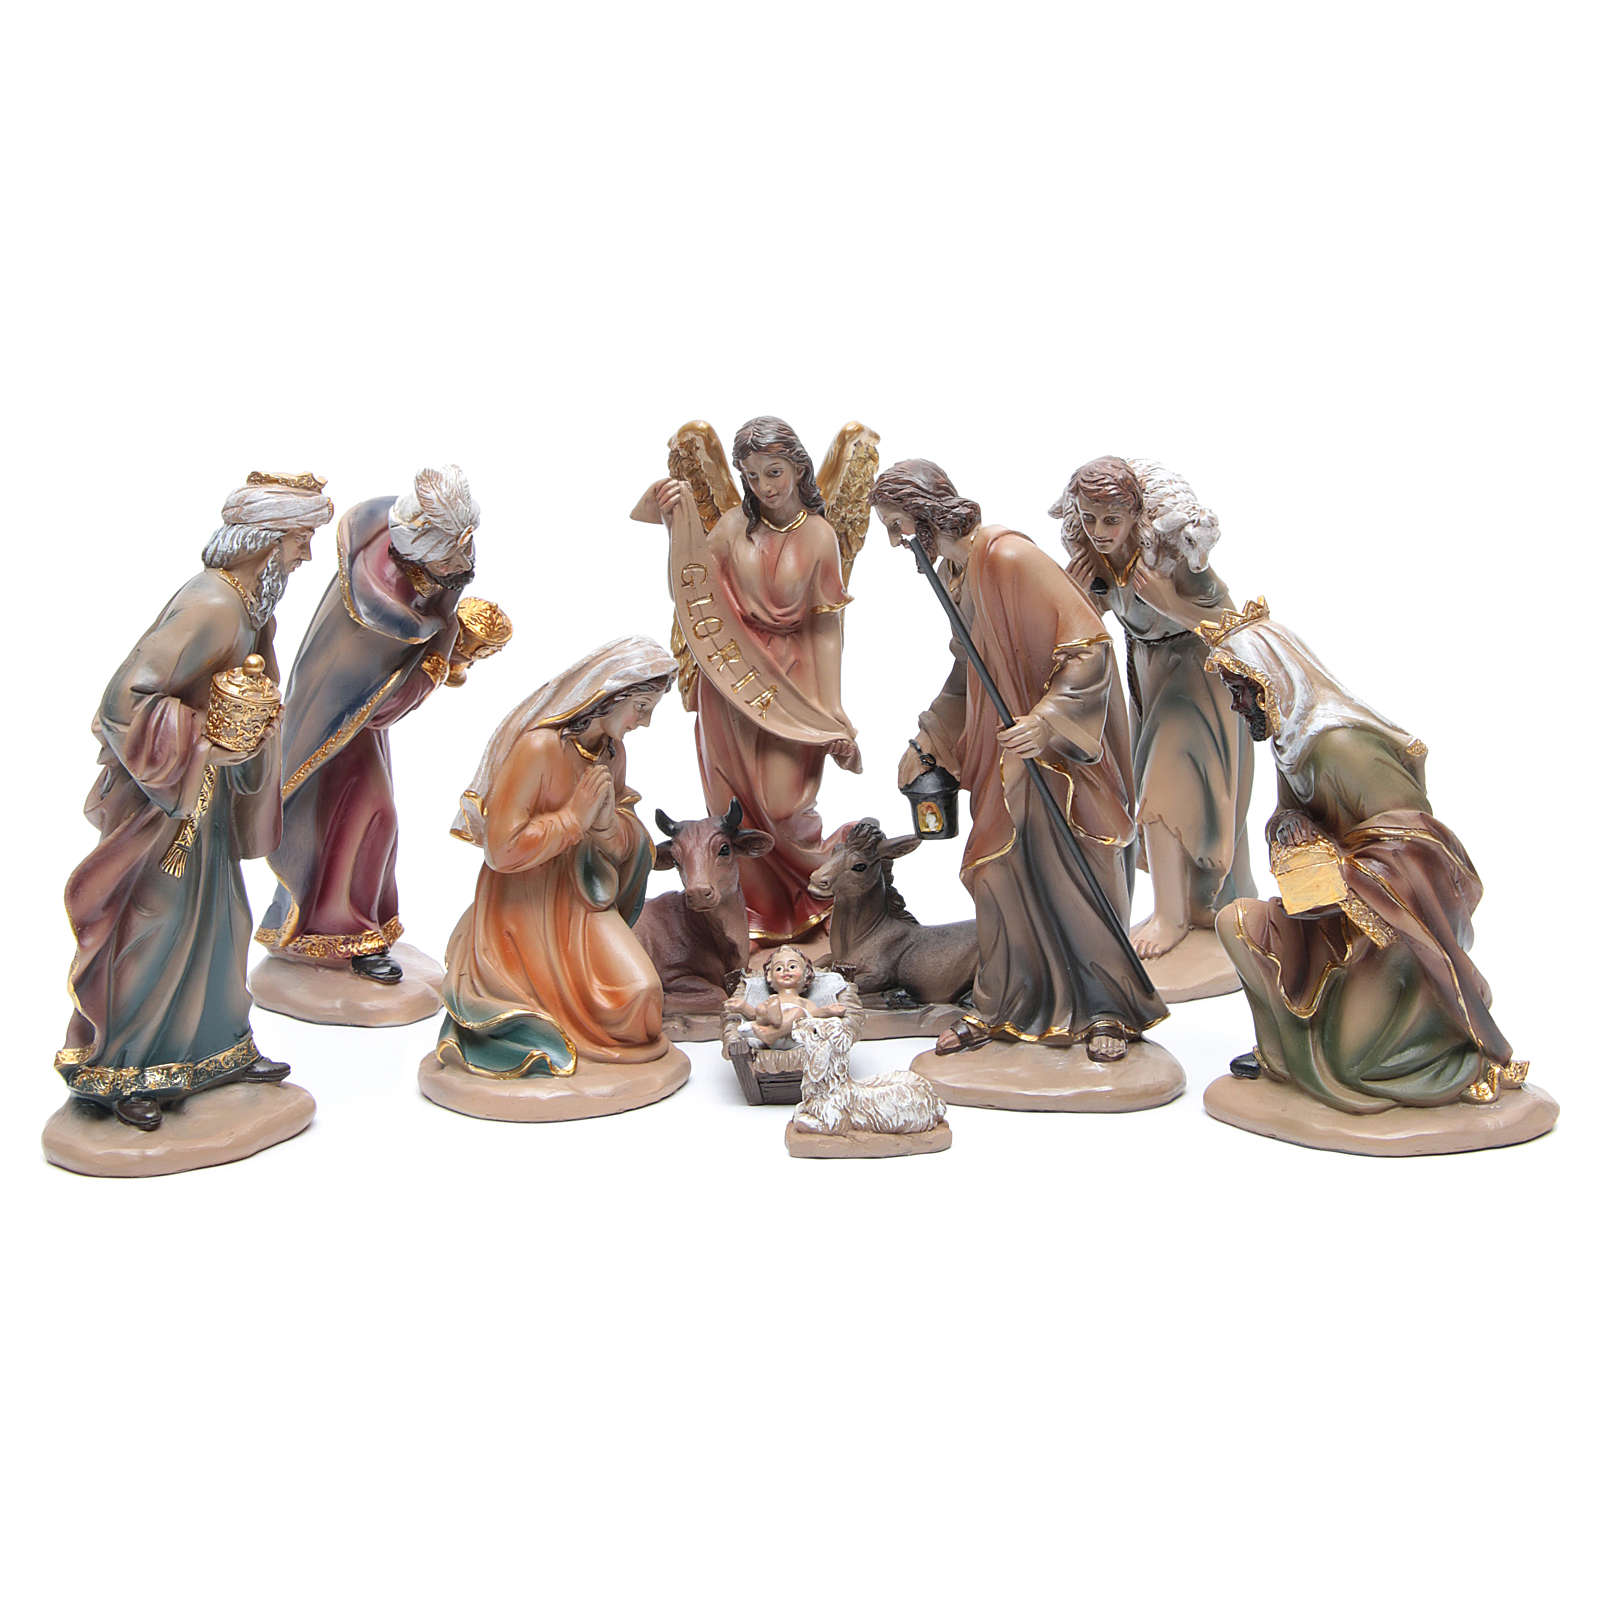 Belén resina 20 cm 11 figuras estilo clásico 4